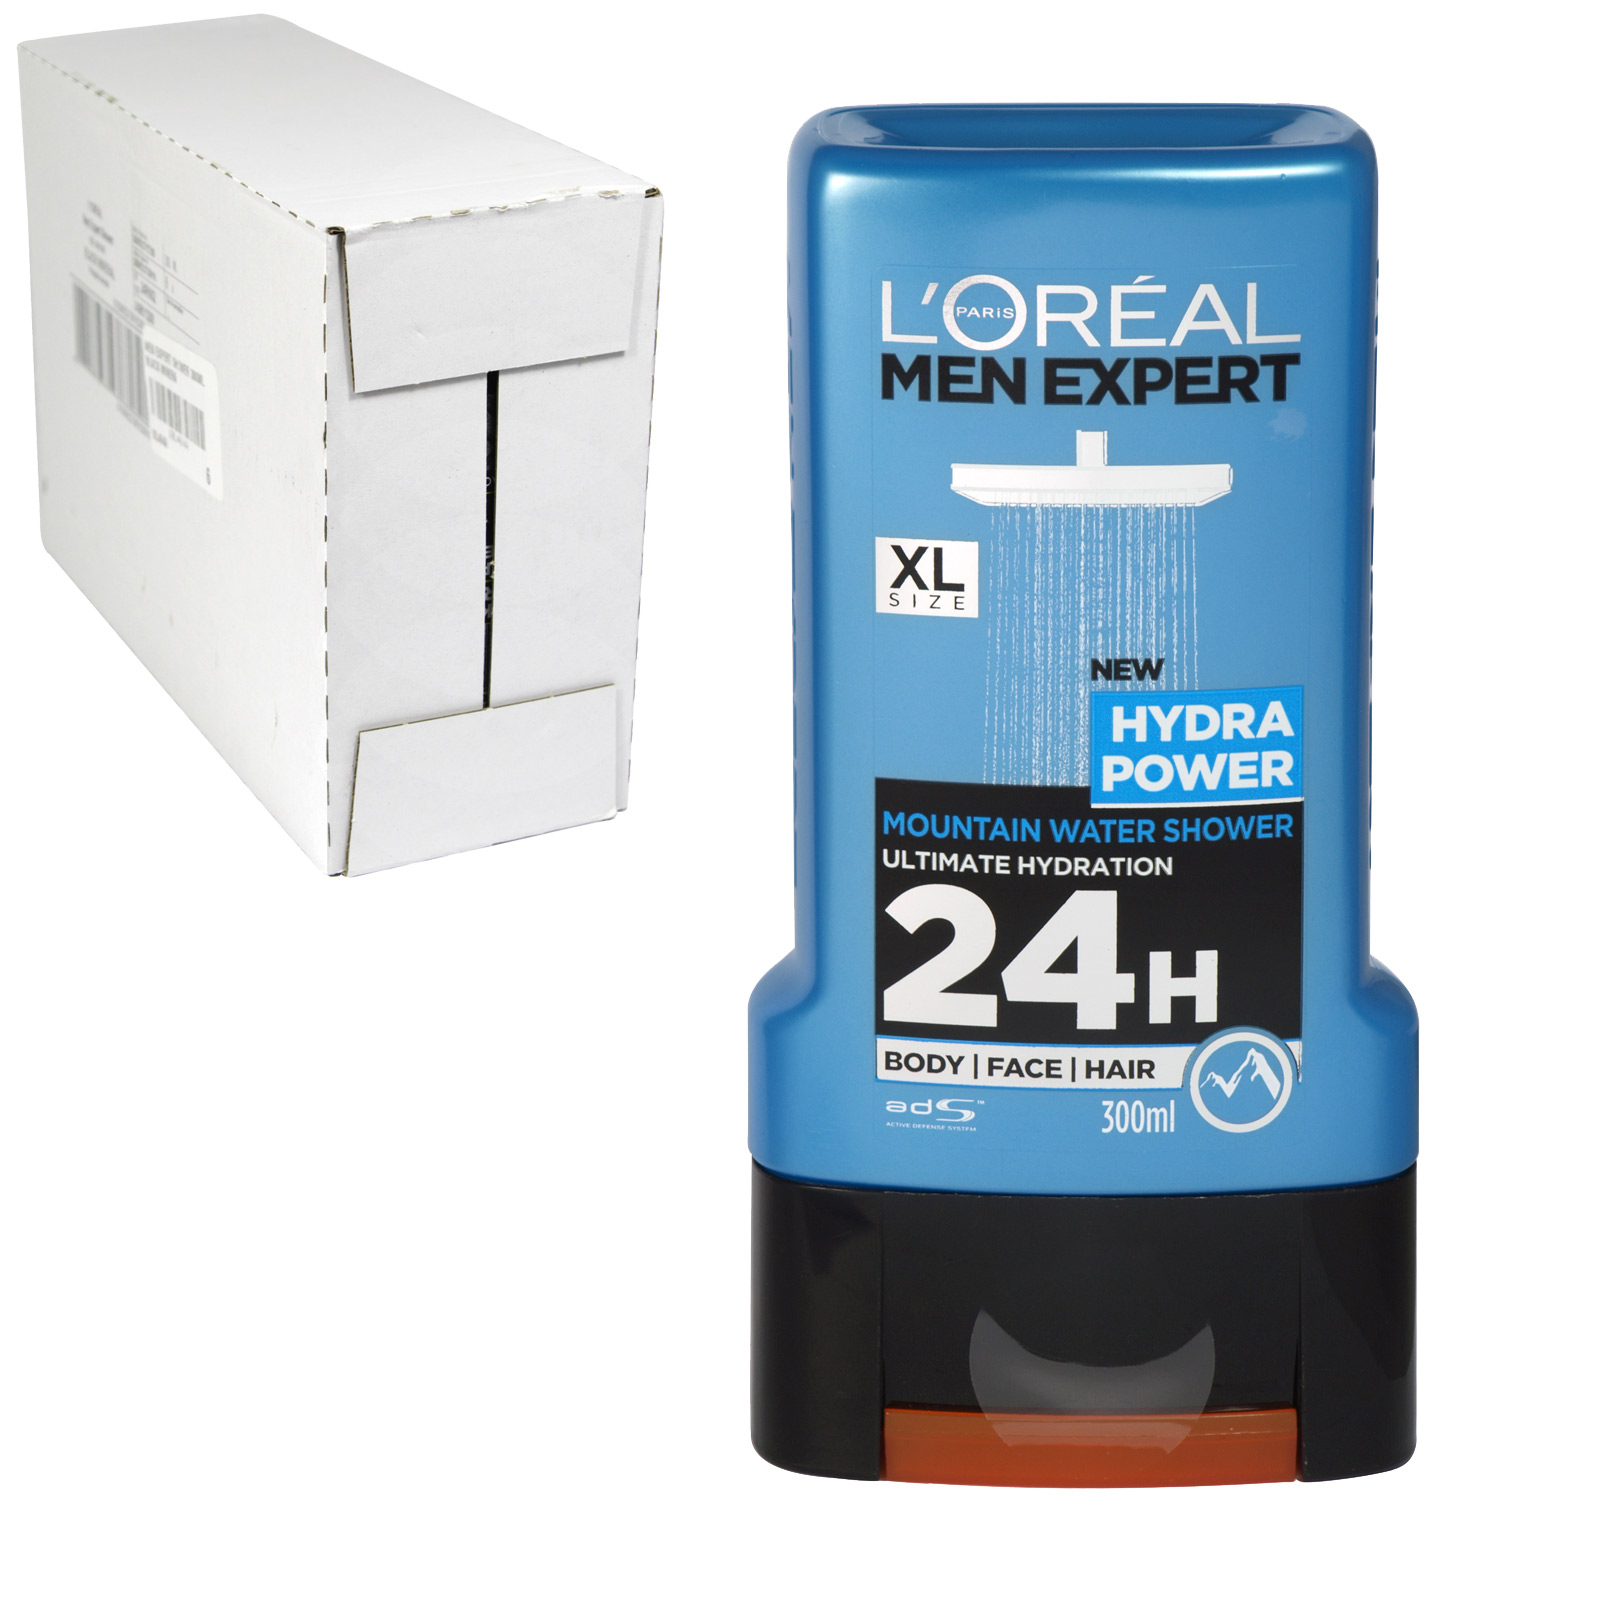 LOREAL MEN EXPERT SHOWER 300ML HYDRA POWER X6